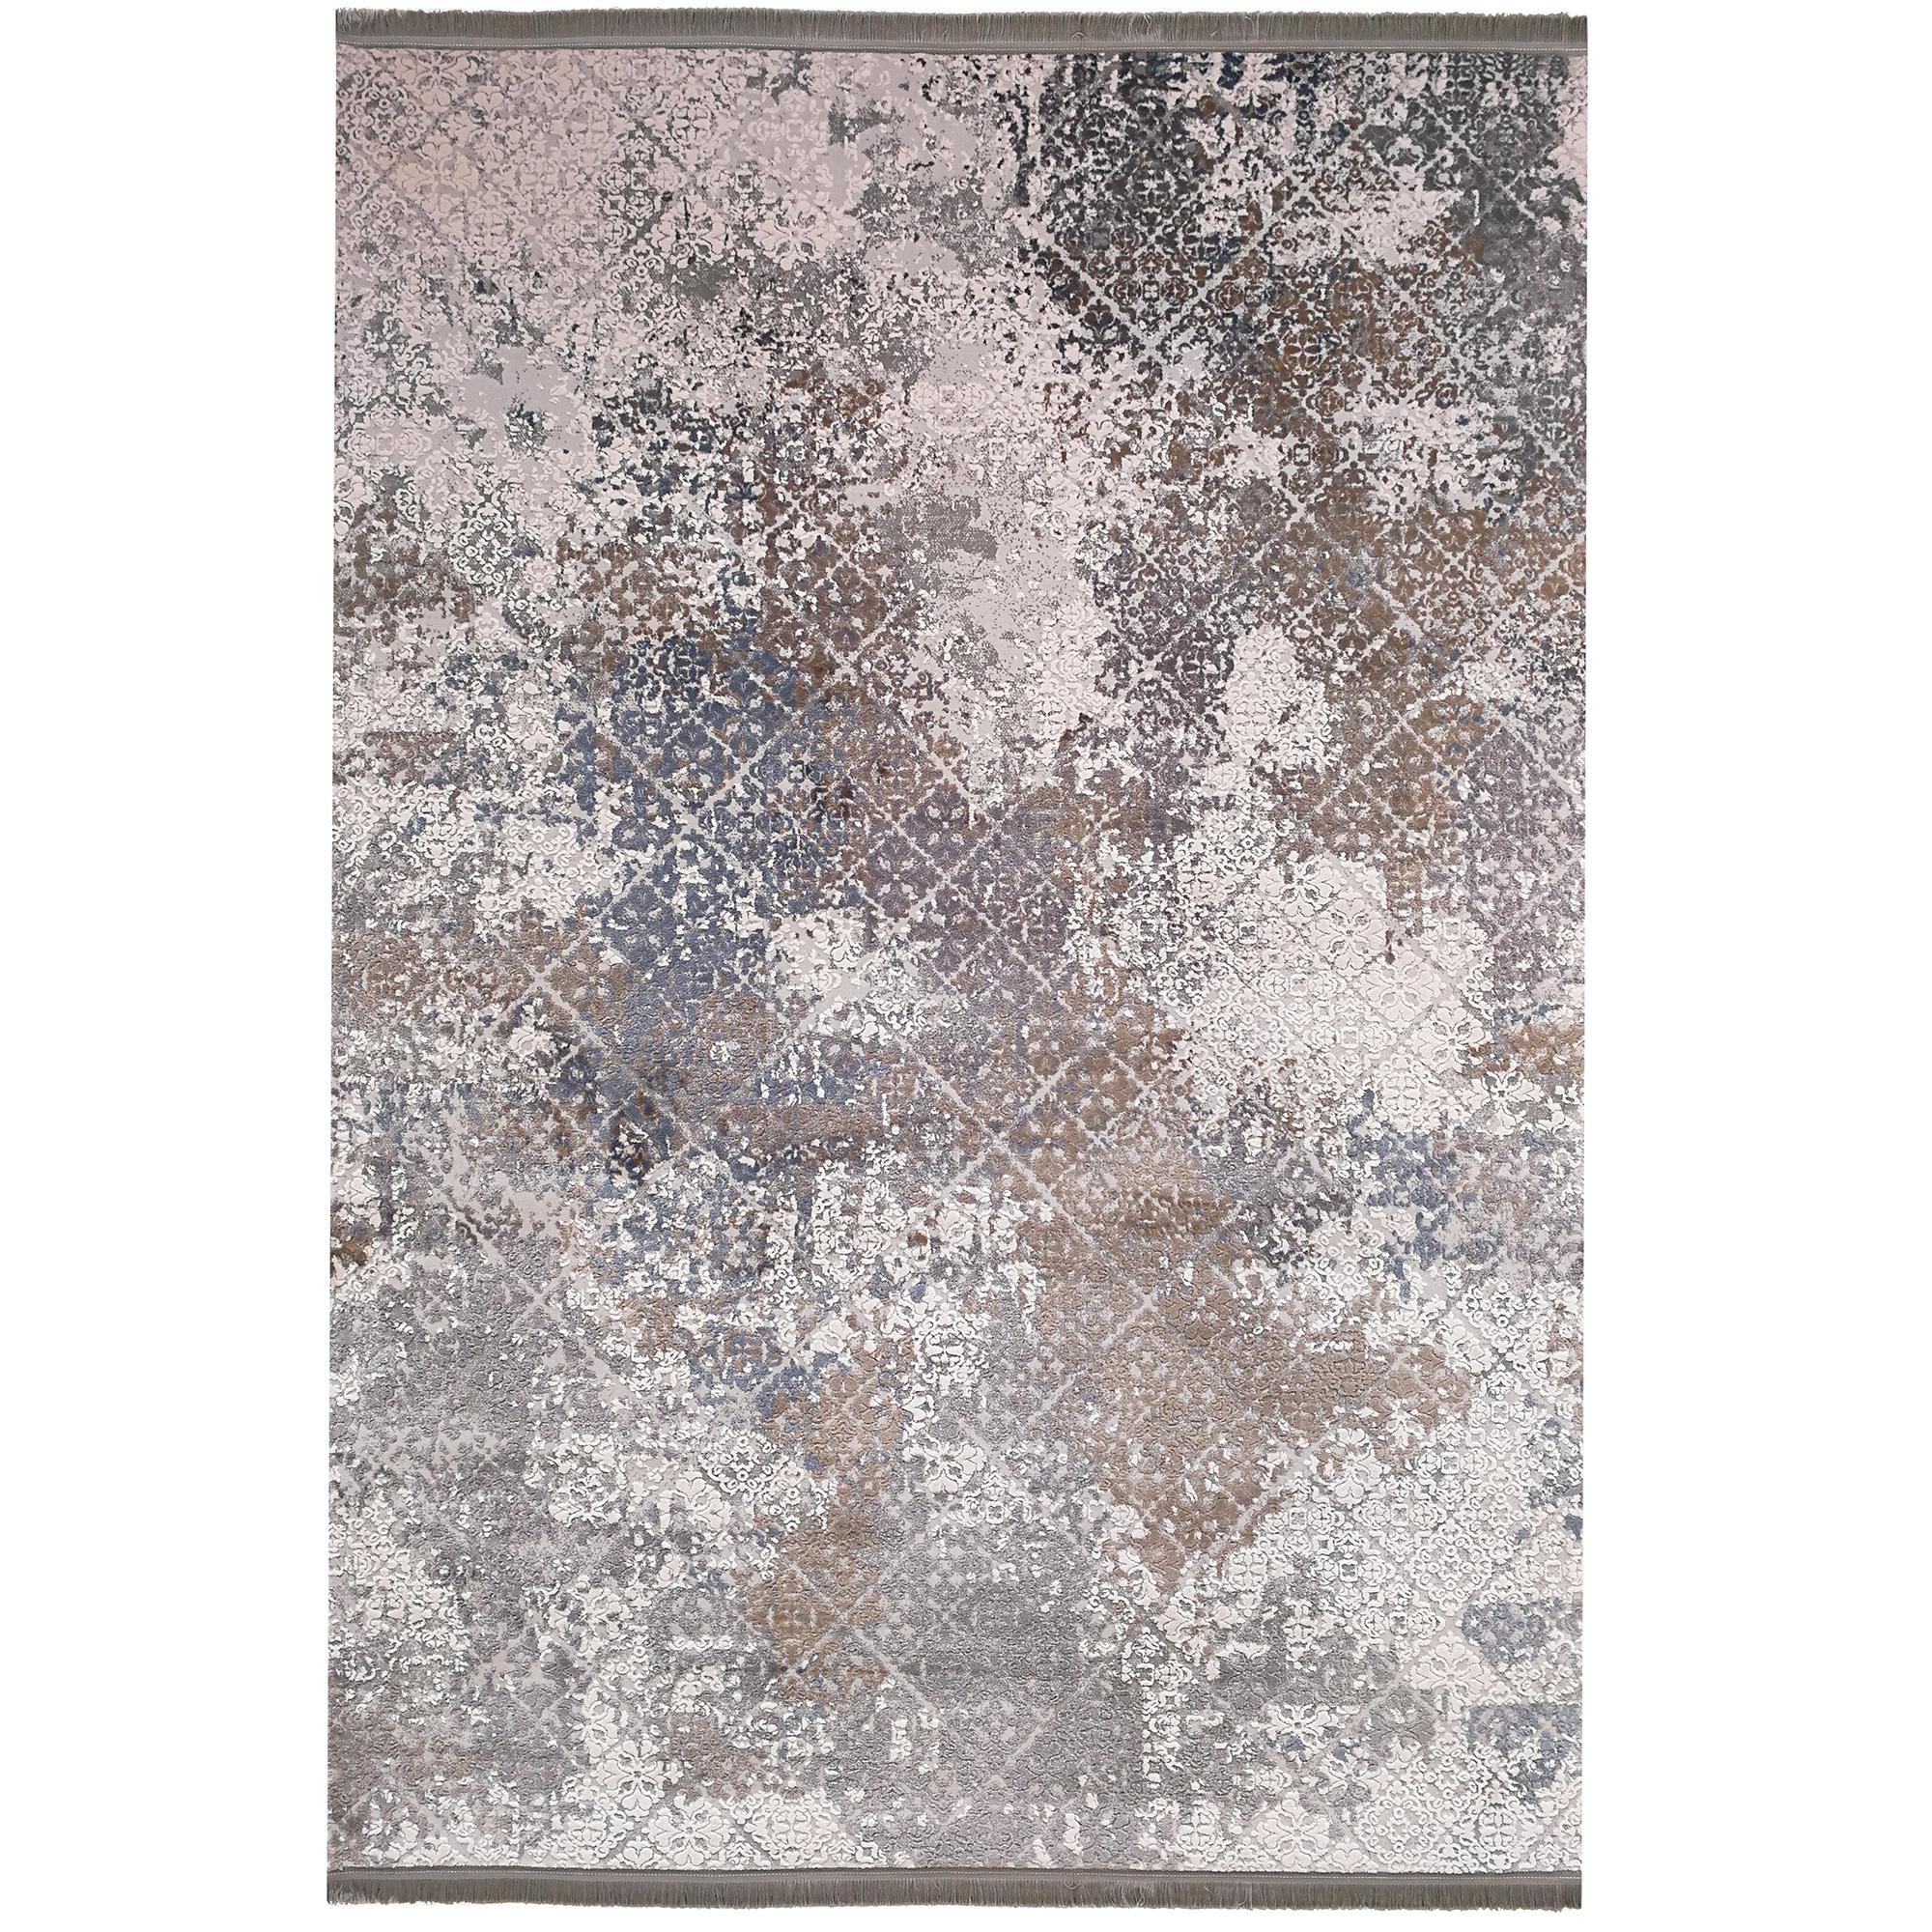 فرش ماشینی زمرد مشهد طرح پتینه کد TA123 زمینه طوسی